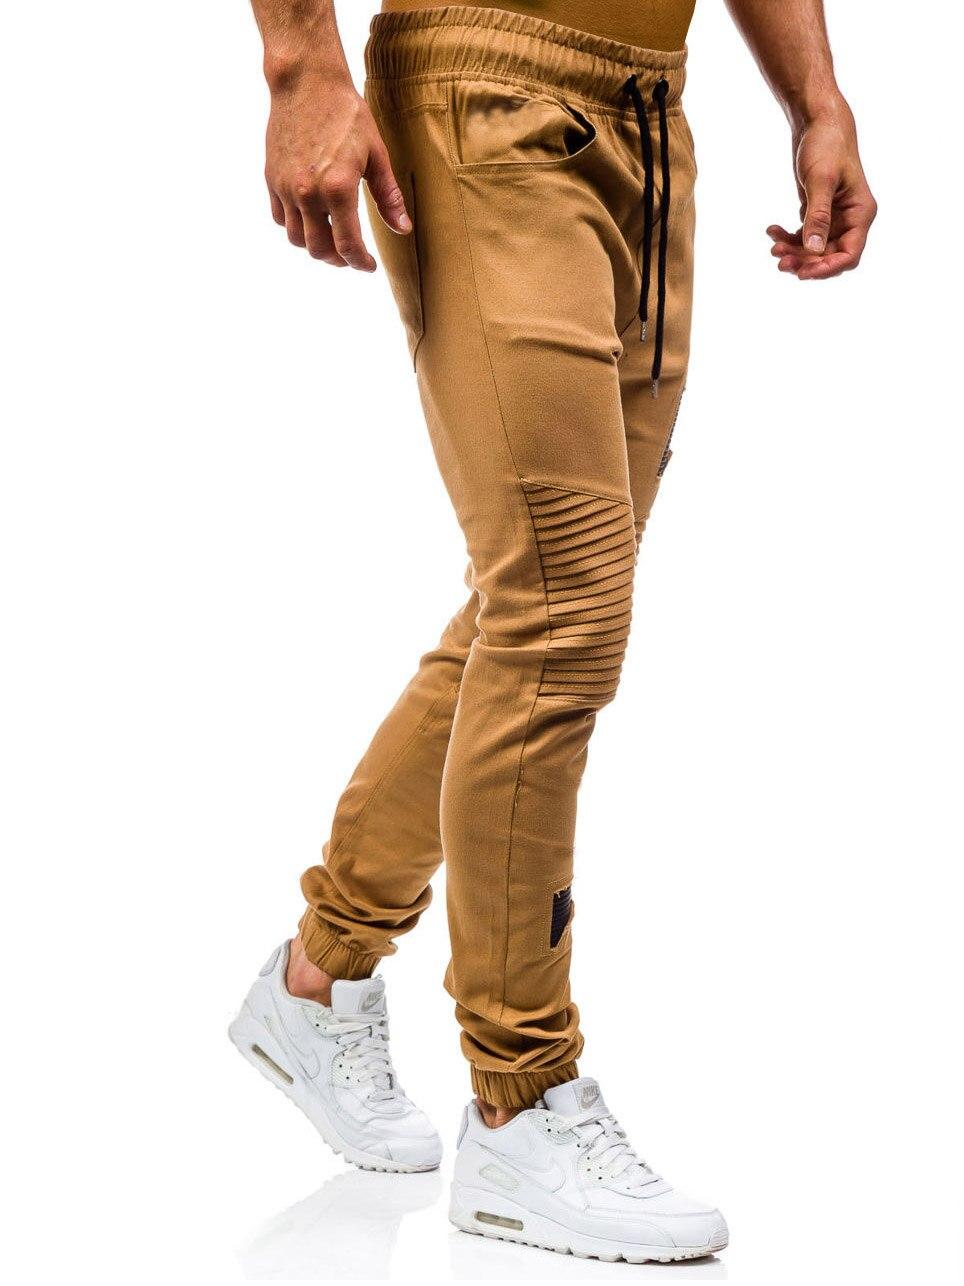 Men Sweatpants Casual Pants Slim fit Drawstring Sweatpants Slacks Elastic Waist Patchwork Pleated Ultrathin Male Trousers Jogger 11